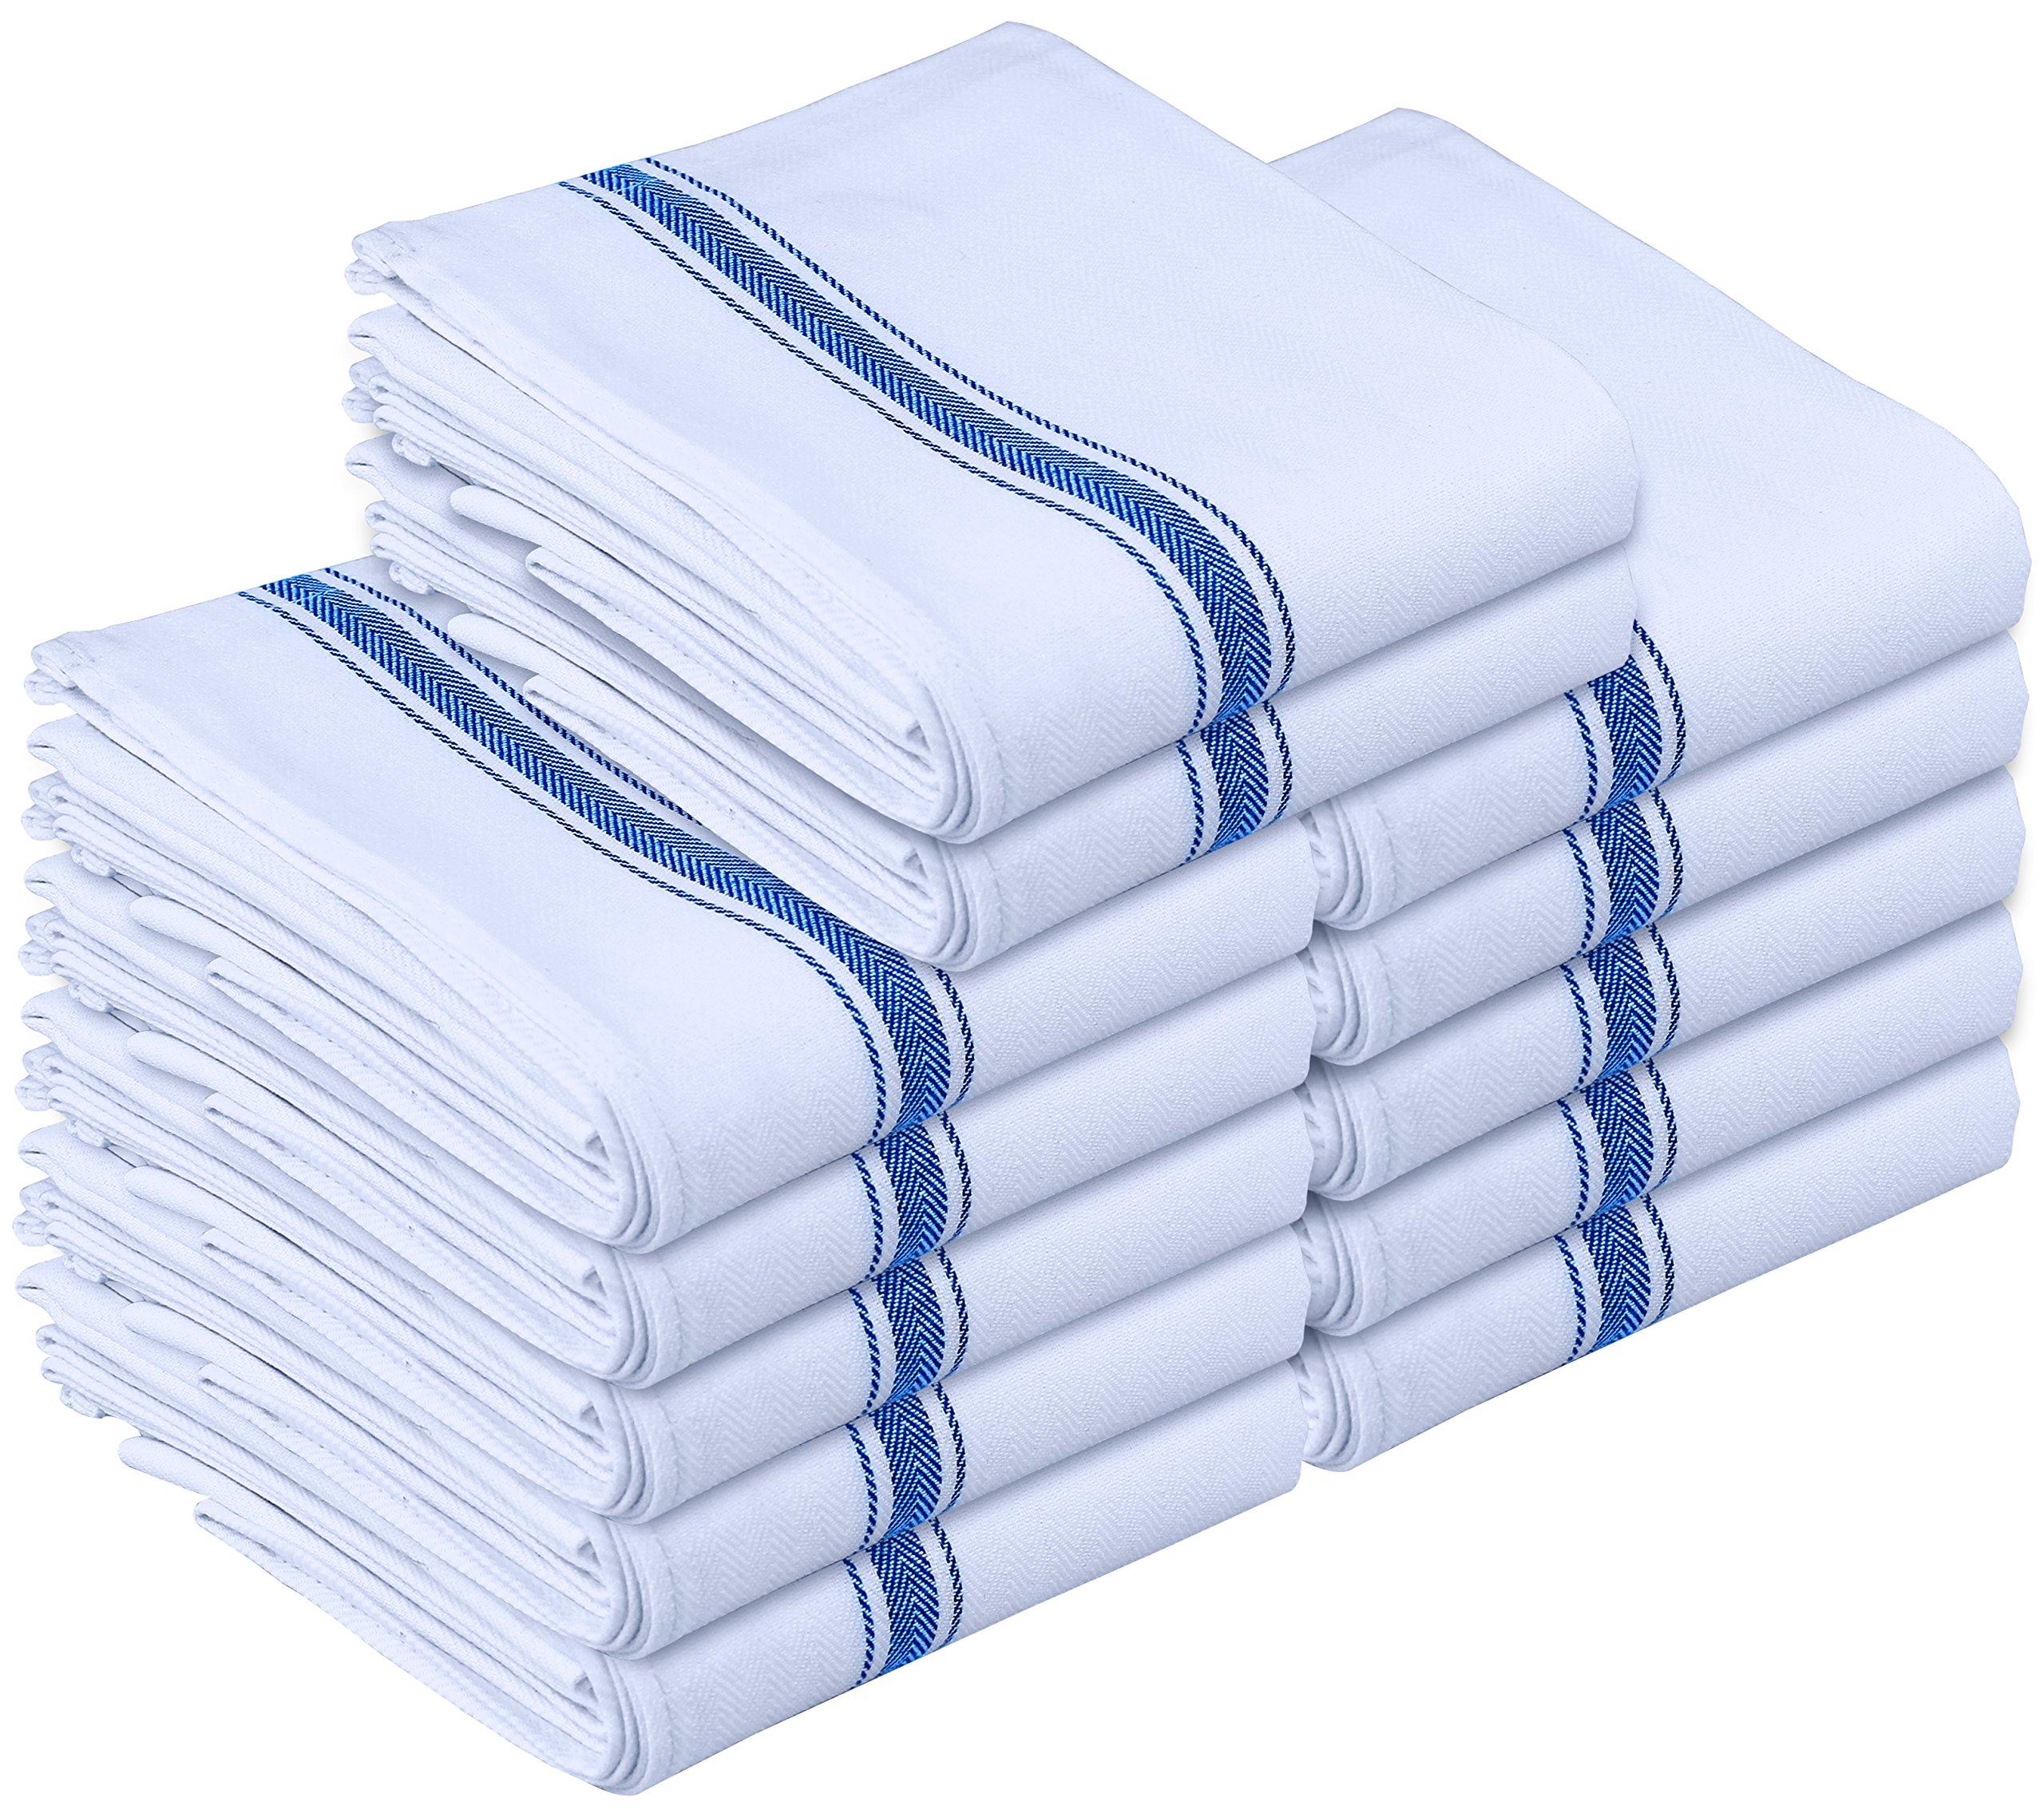 Utopia Towels Kitchen Towels - Dish Cloth (12 Pack) - Machine Washable Cotton White Kitchen Dishcloths, Dish Towel & Tea Towels (15 x 25 Inch) - by